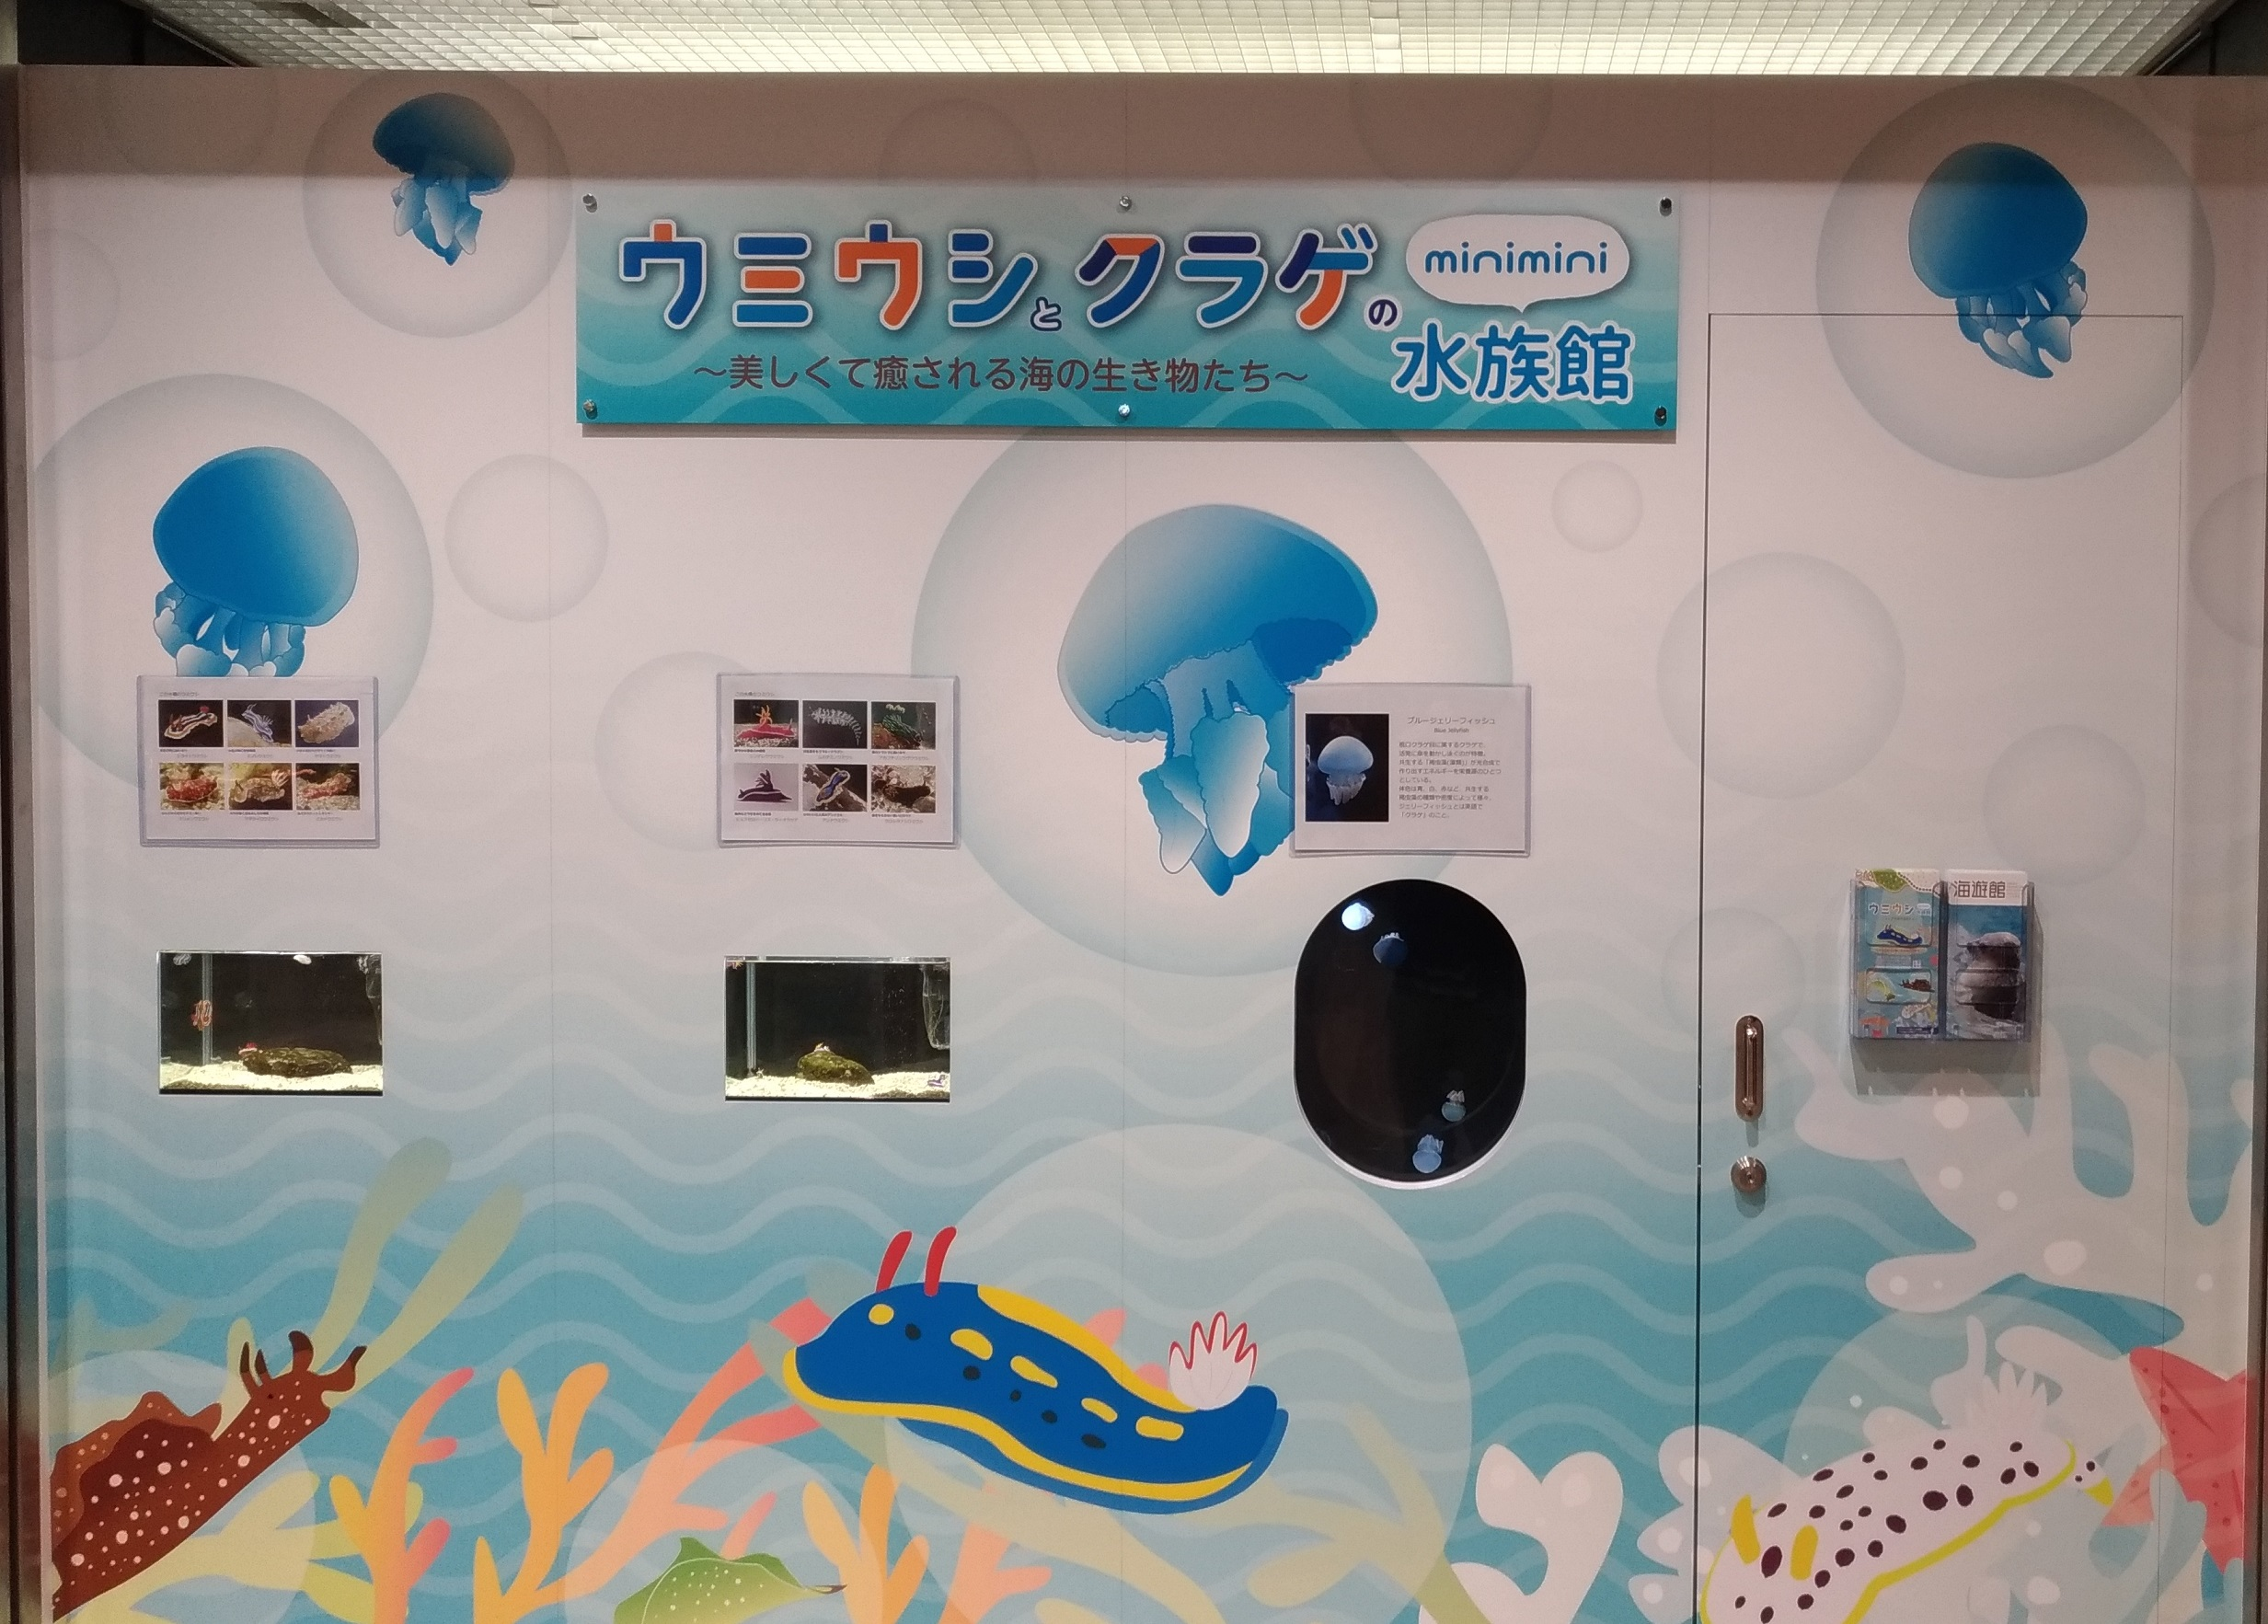 osaka_dotica_umeda_kaiyukan_1.jpg